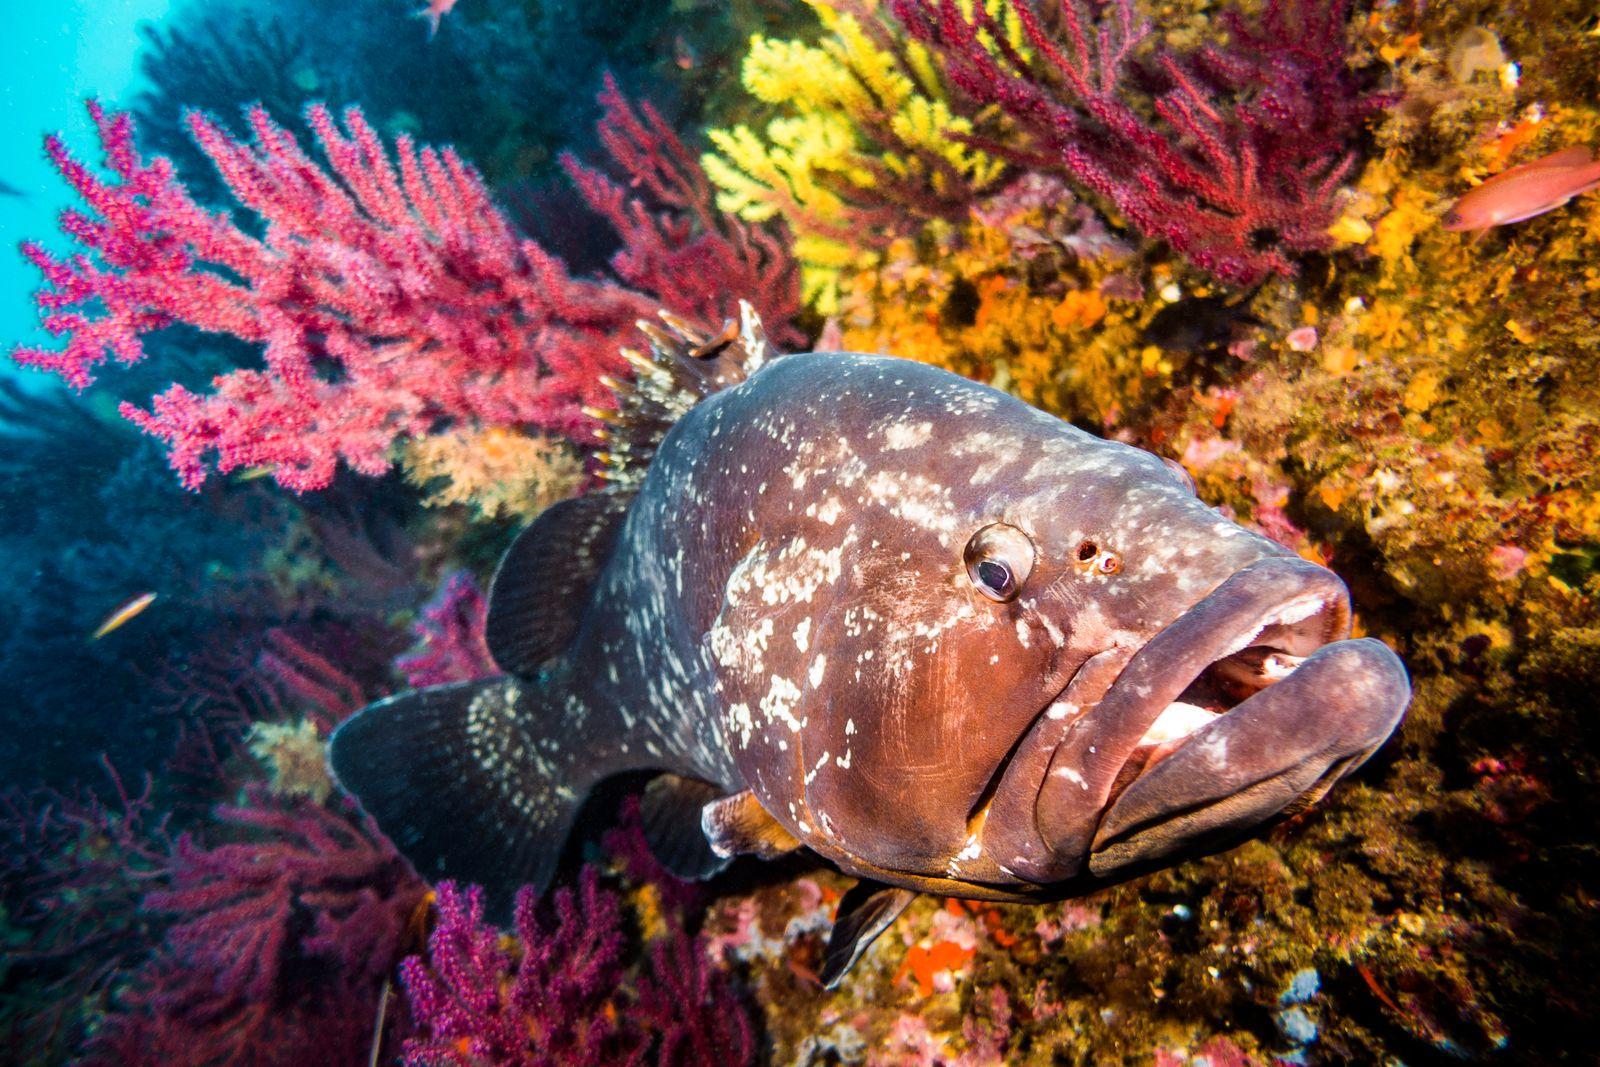 mero cherna coral Epinephelus marginatus Epinephelinae horizontal open mouth gorgonia